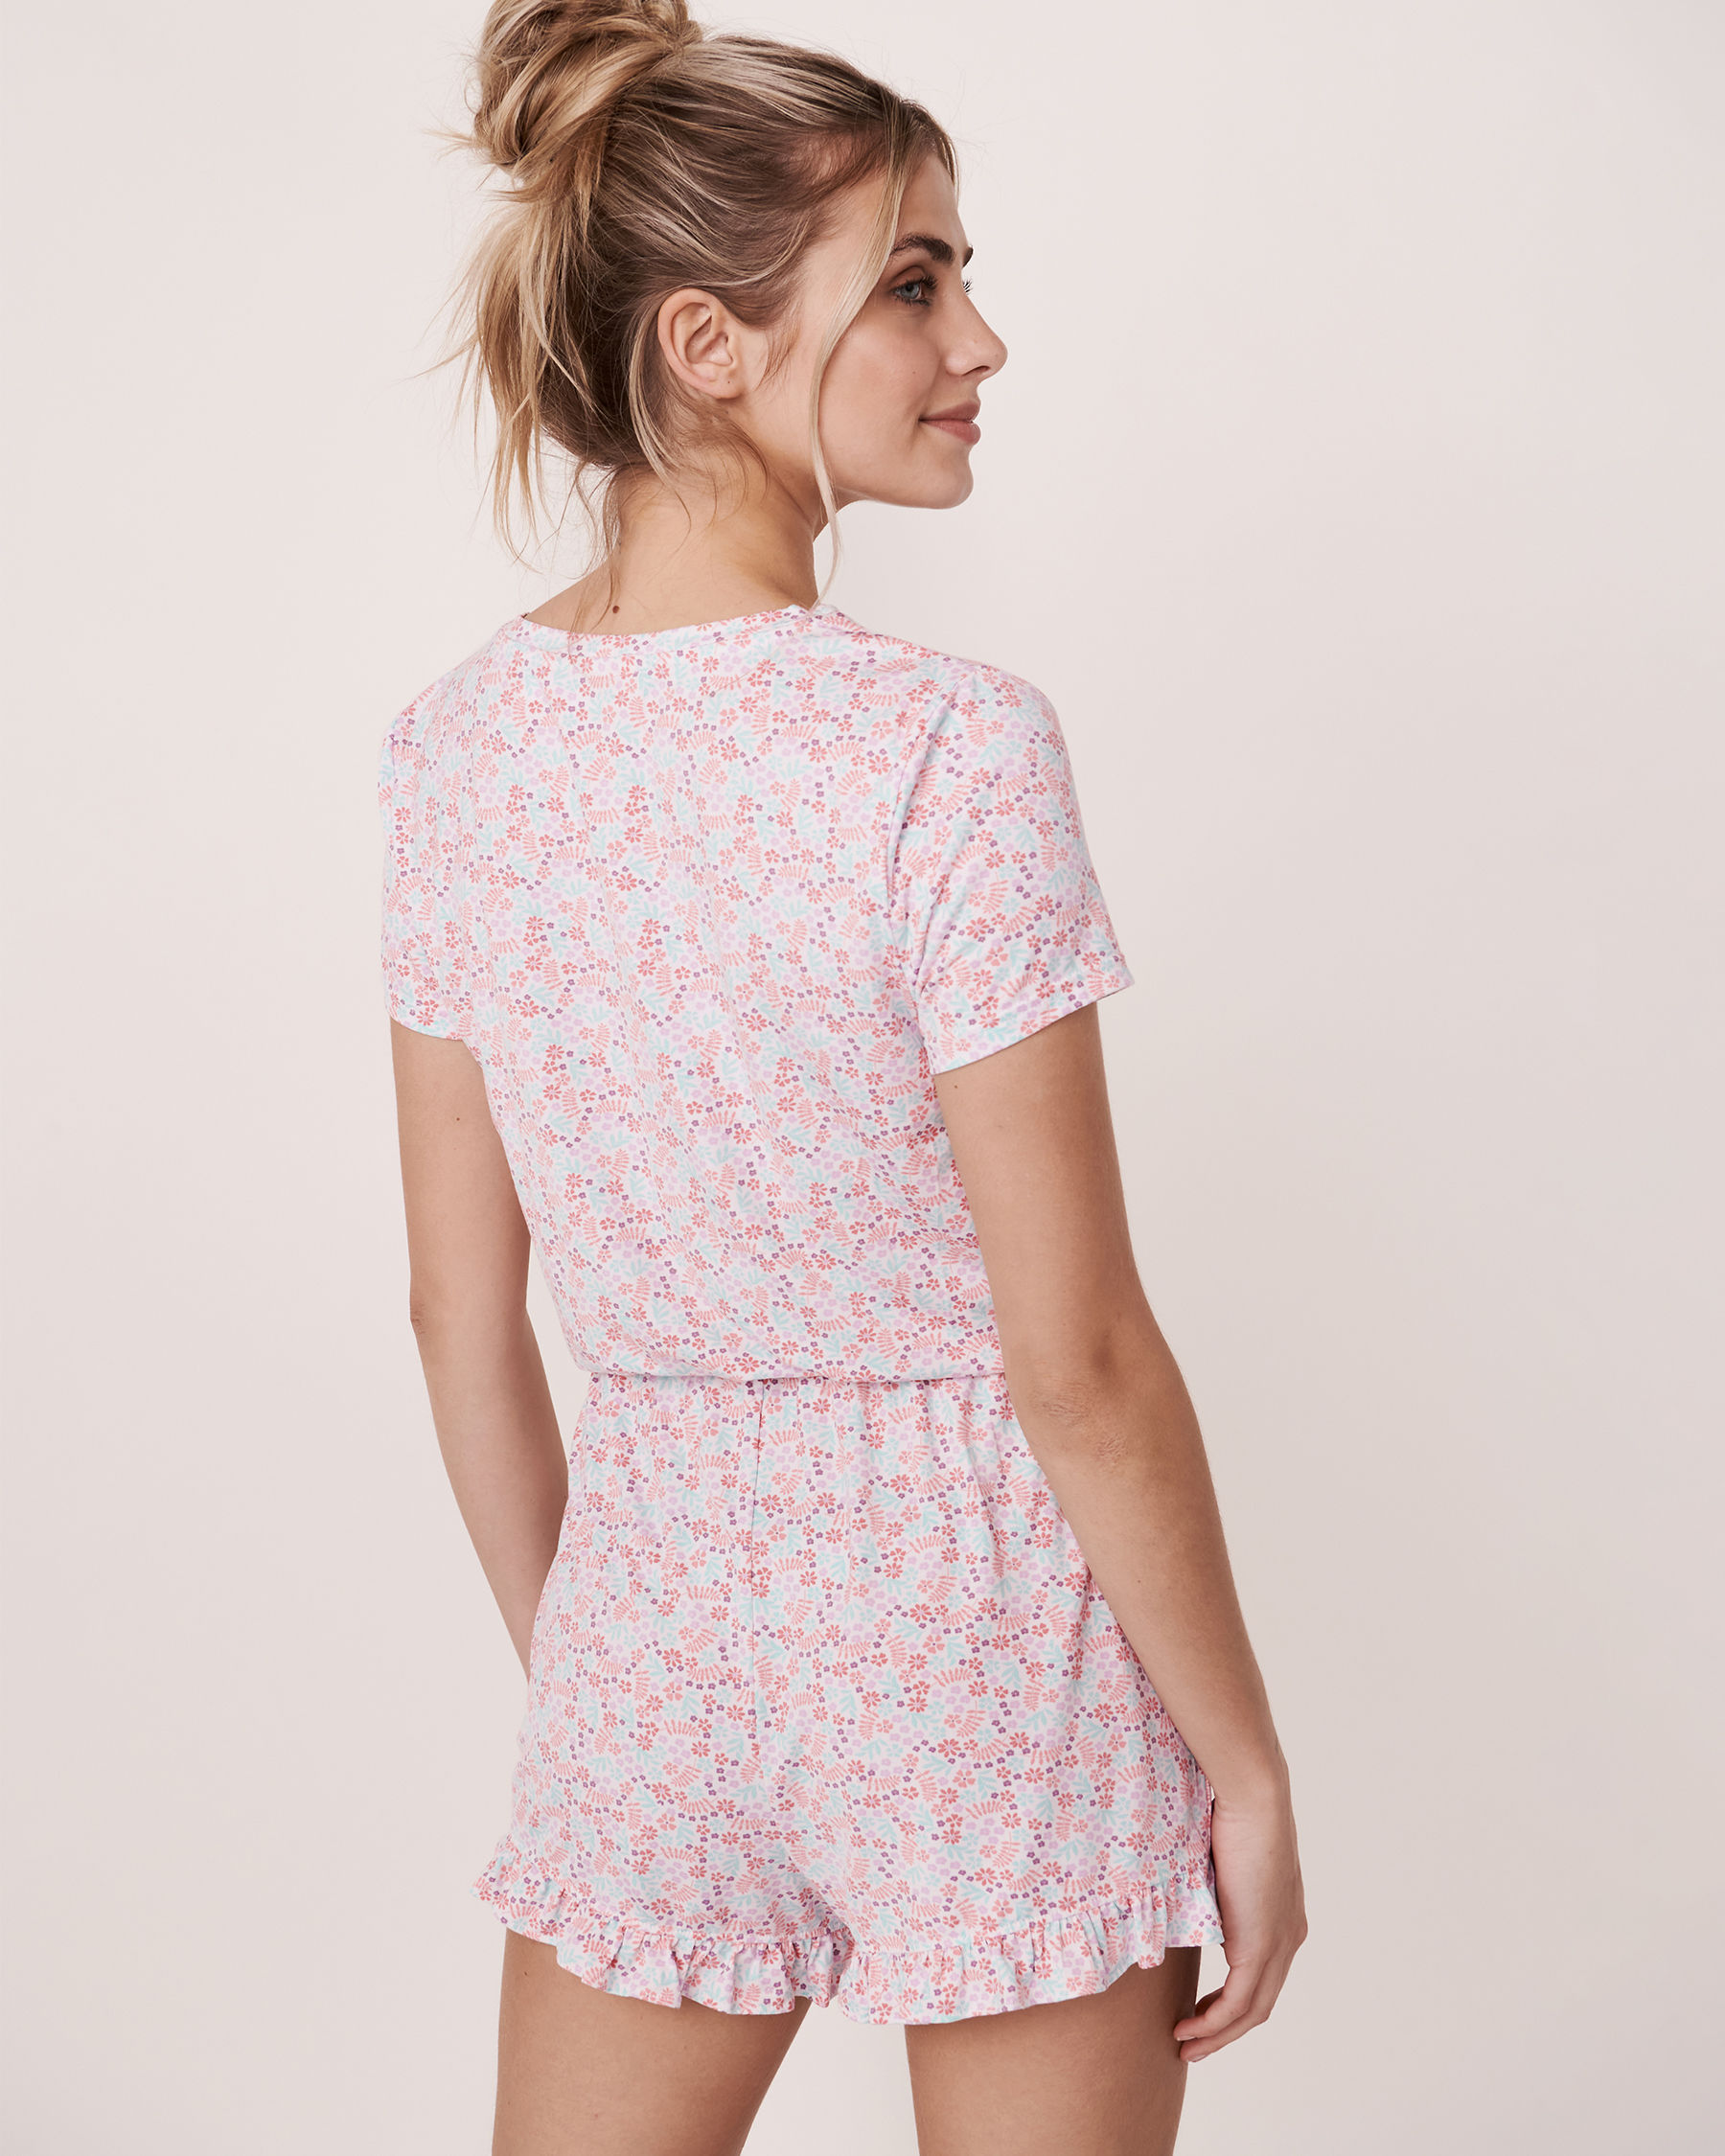 LA VIE EN ROSE Ruffle Details Short Sleeve Romper Ditsy floral 40300012 - View2